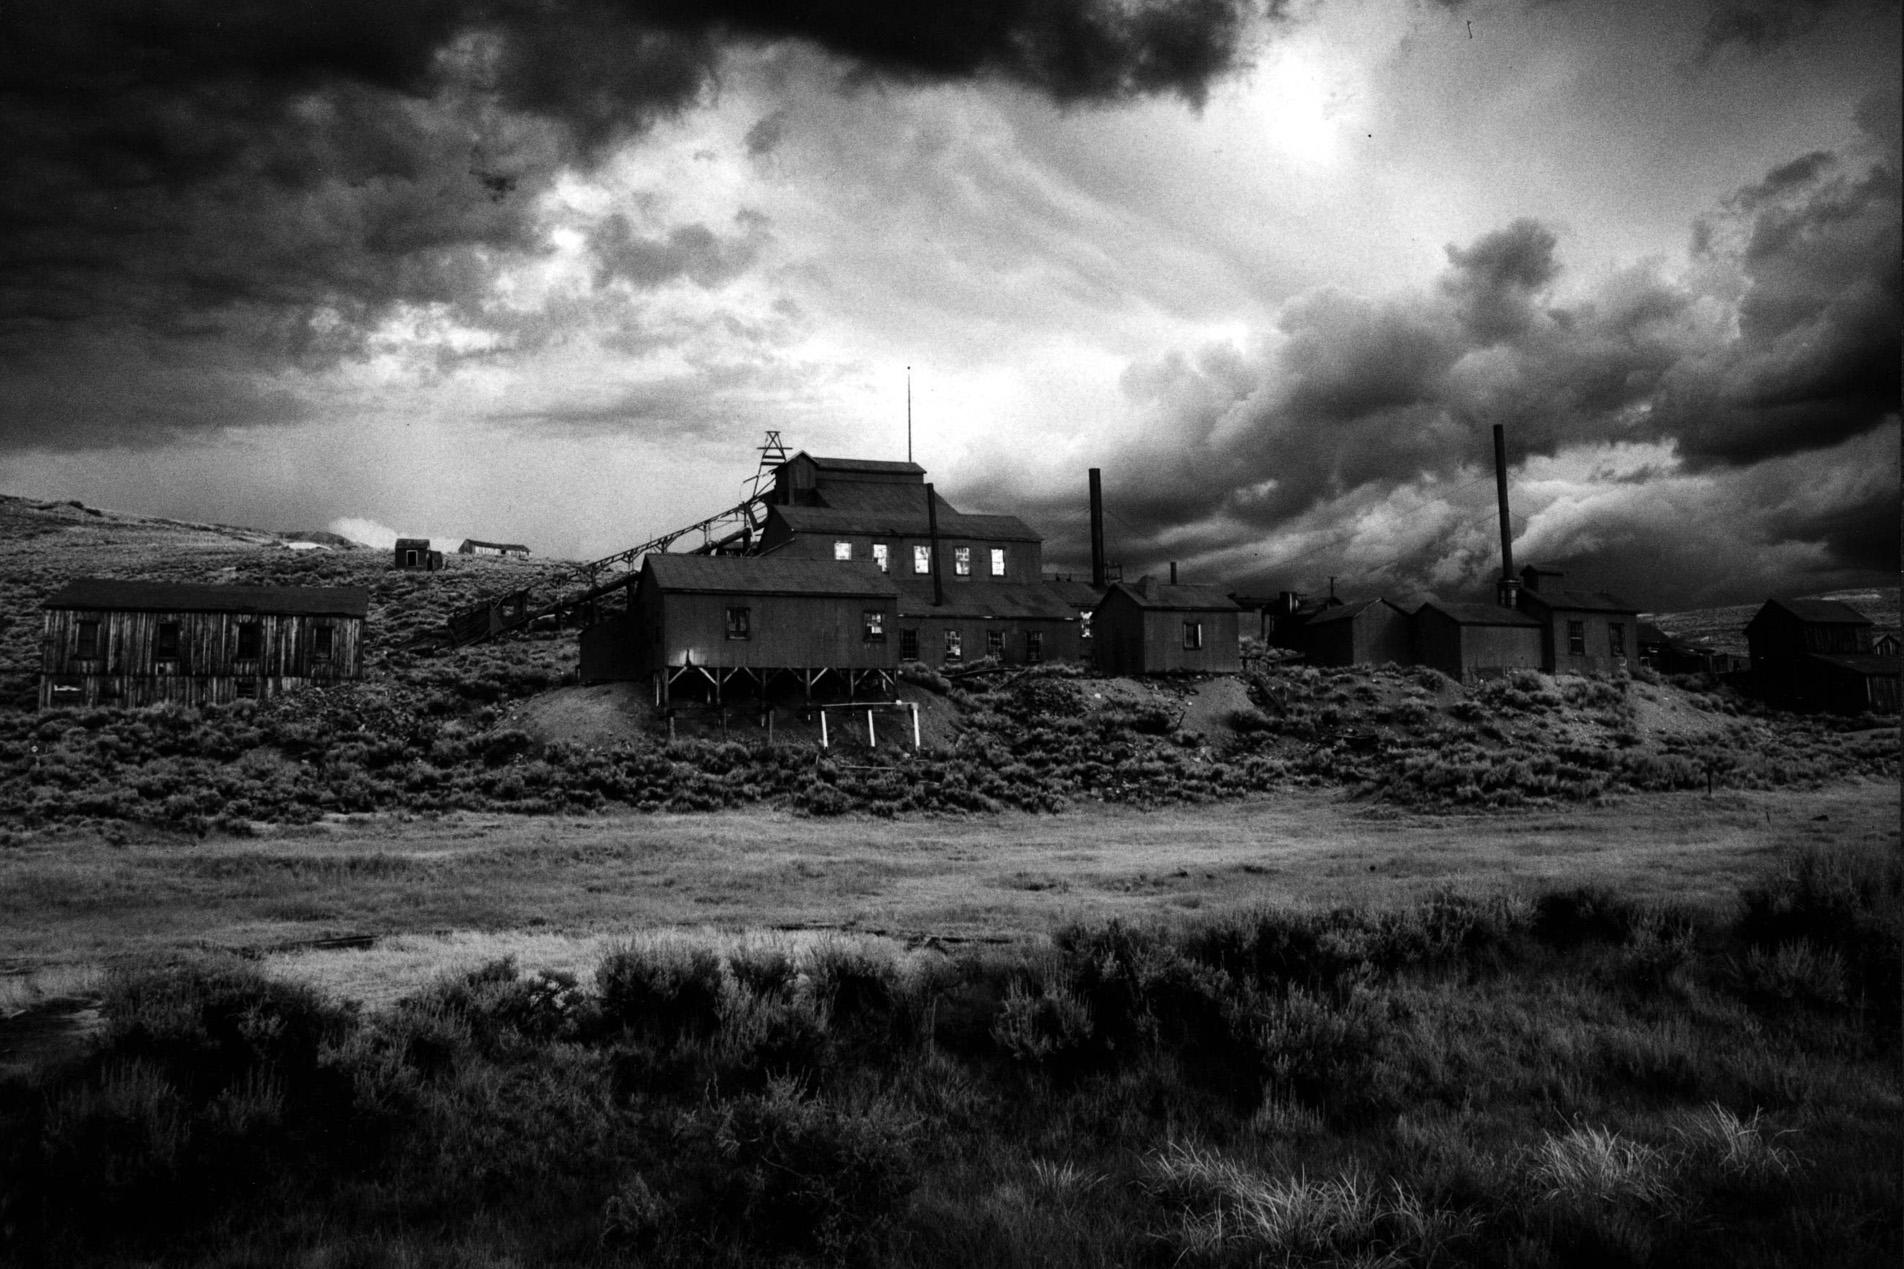 Deserted • Eerie Soundscape Generator